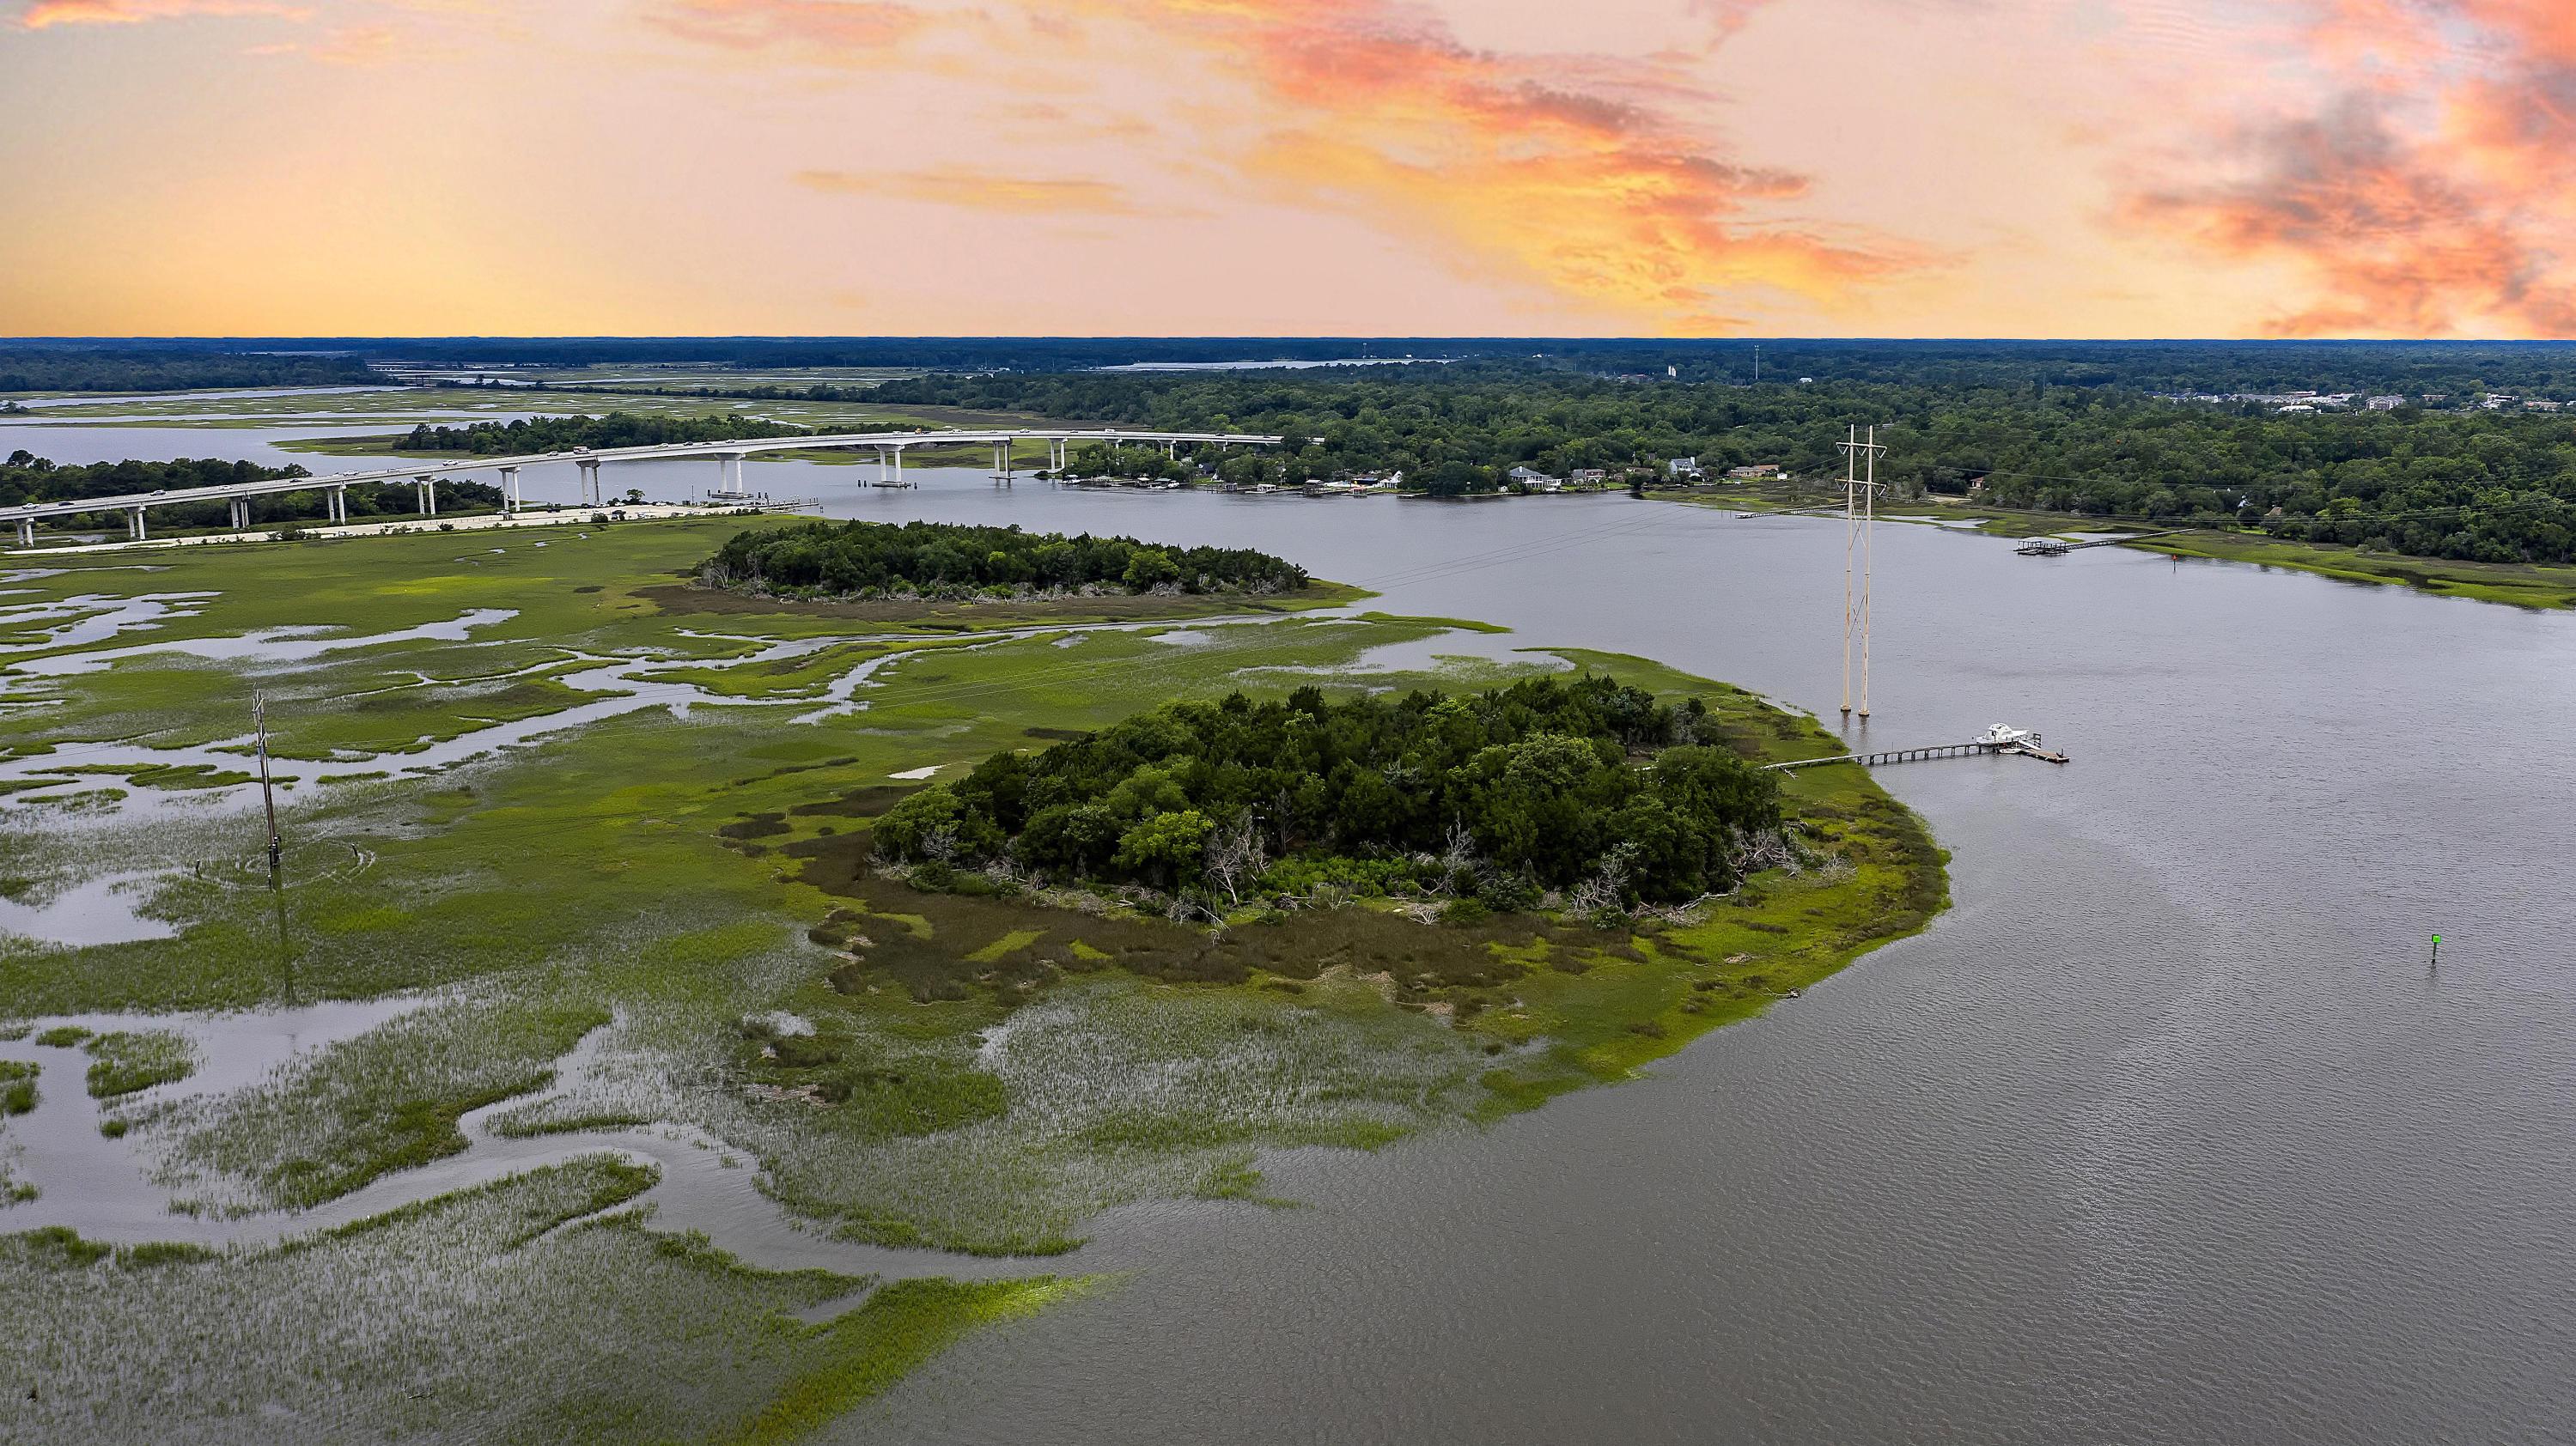 Stono River Johns Island, SC 29455